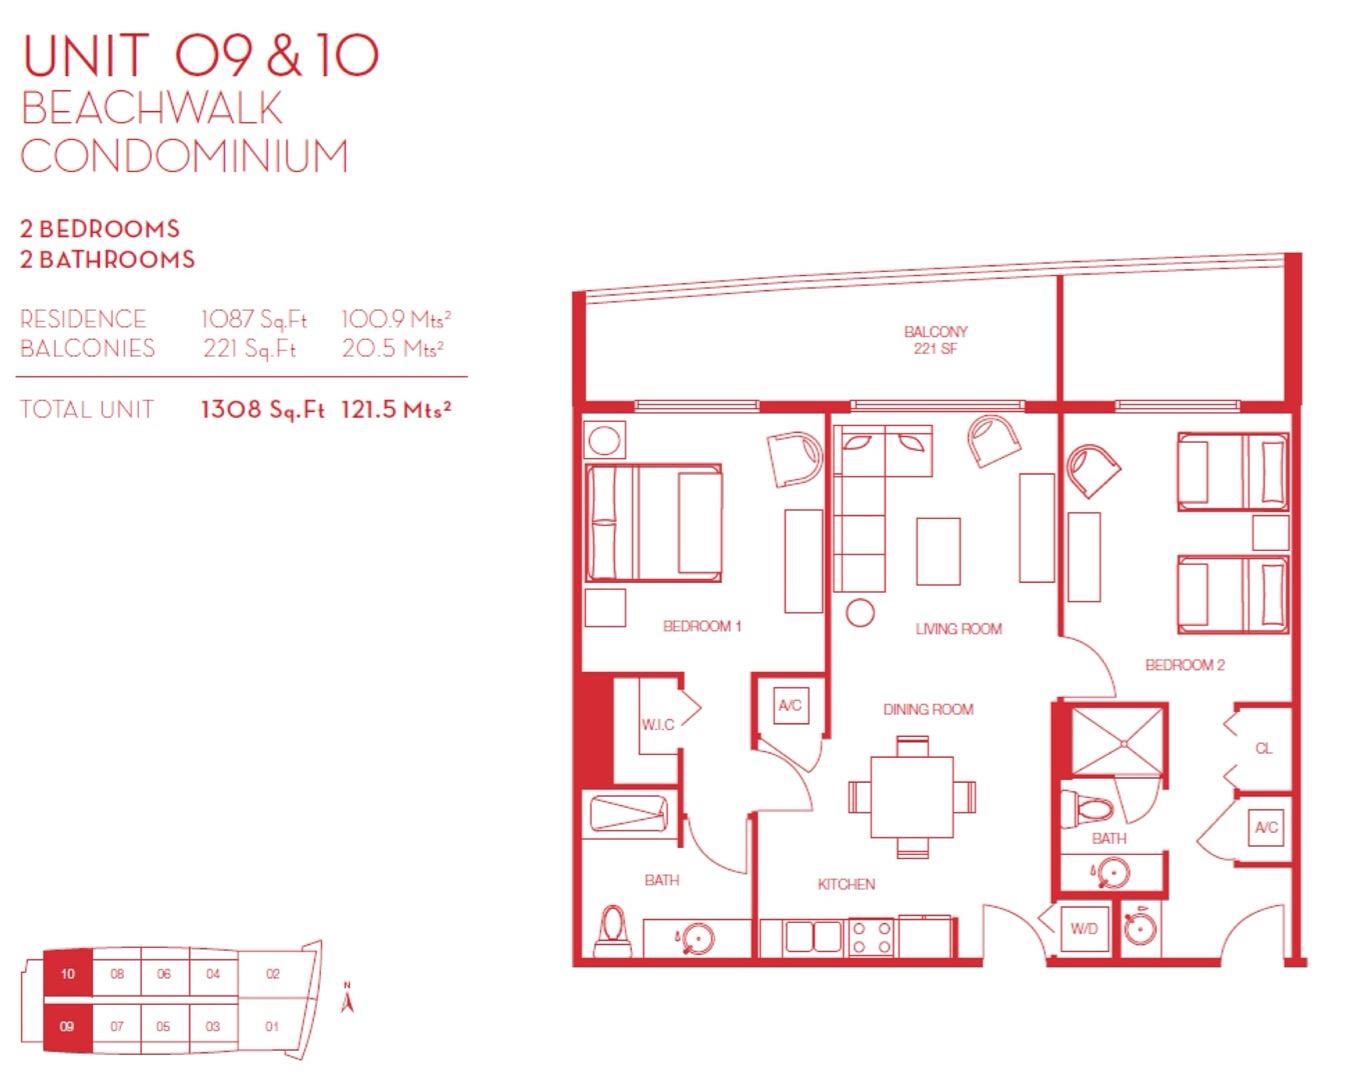 Floor plan image 09 & 10 - 2/2  - 1087 sqft image